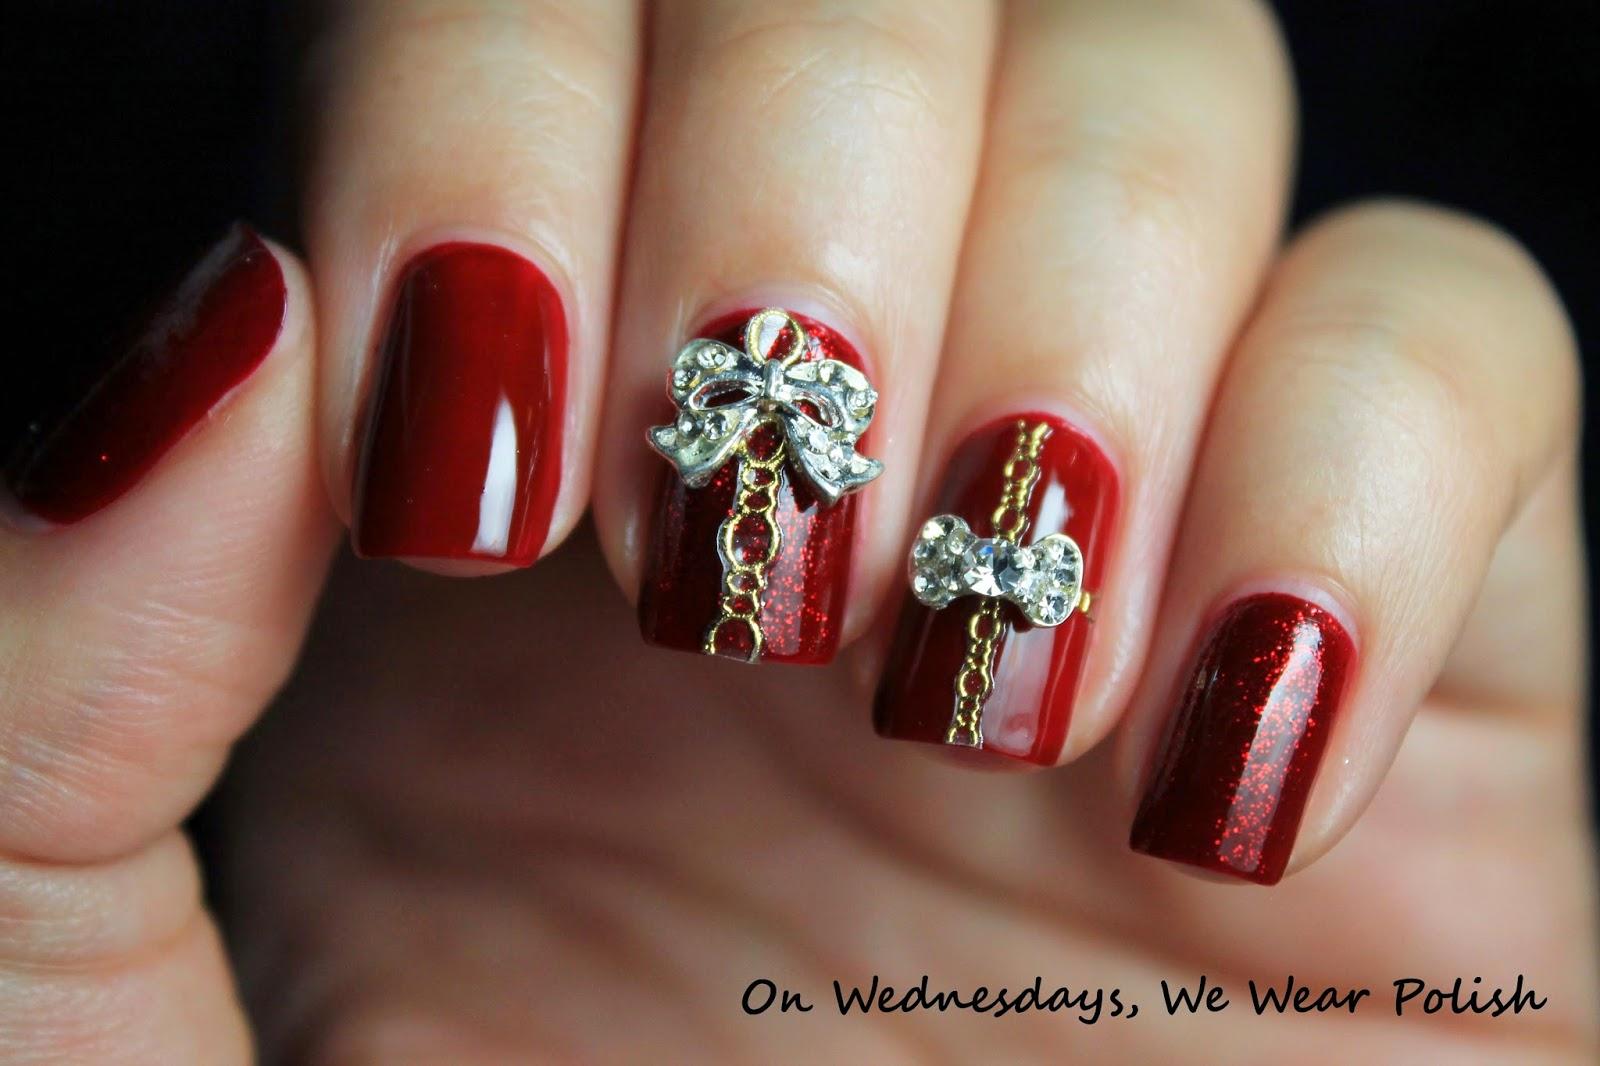 On Wednesdays, We Wear Polish : \'Tis the Season for Holiday Nail Art